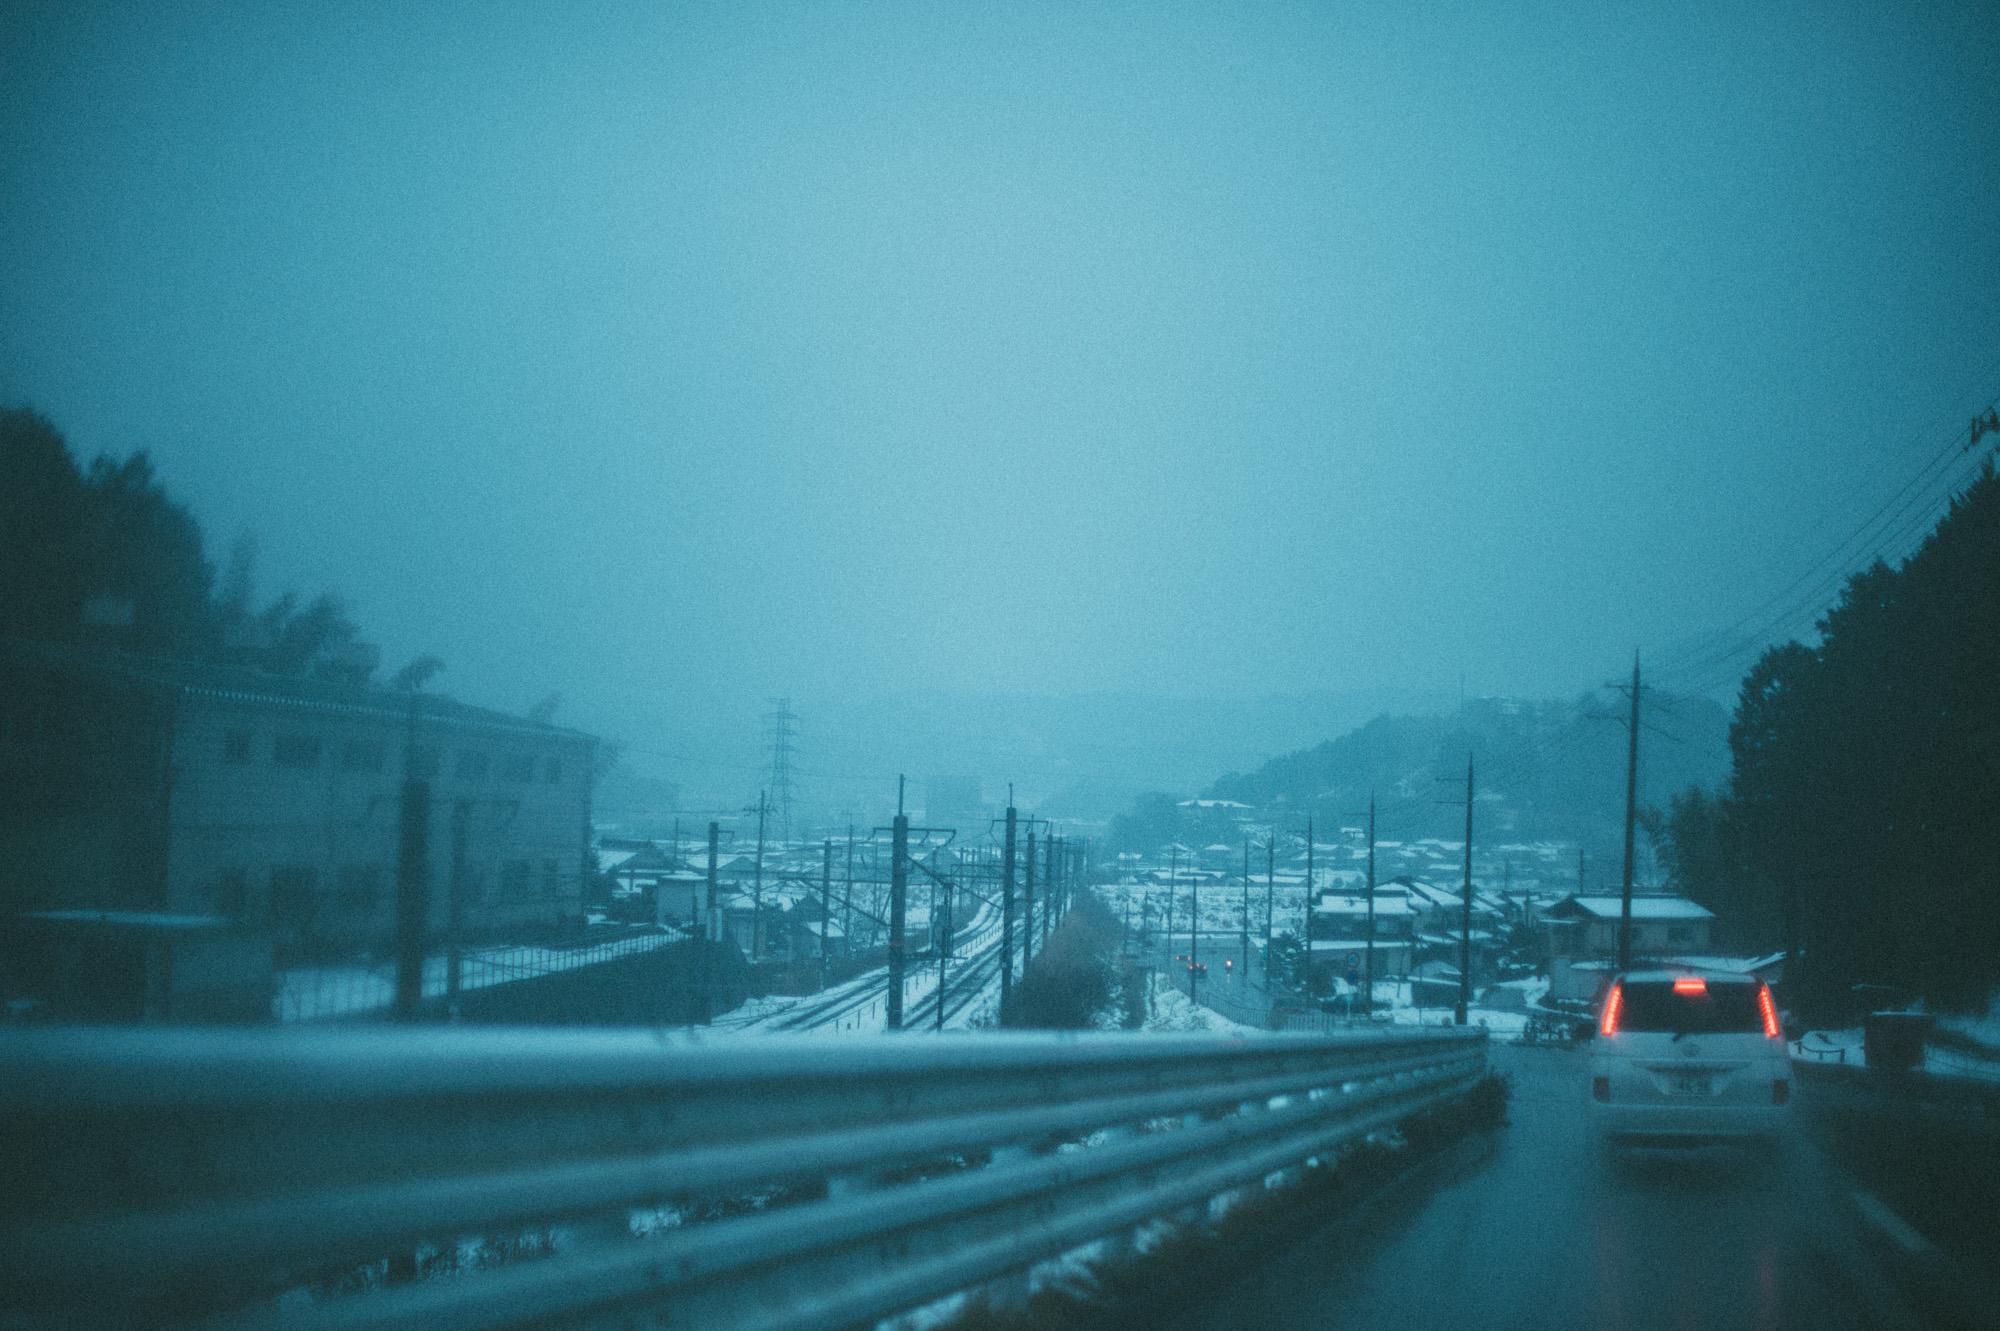 福知山前撮り120